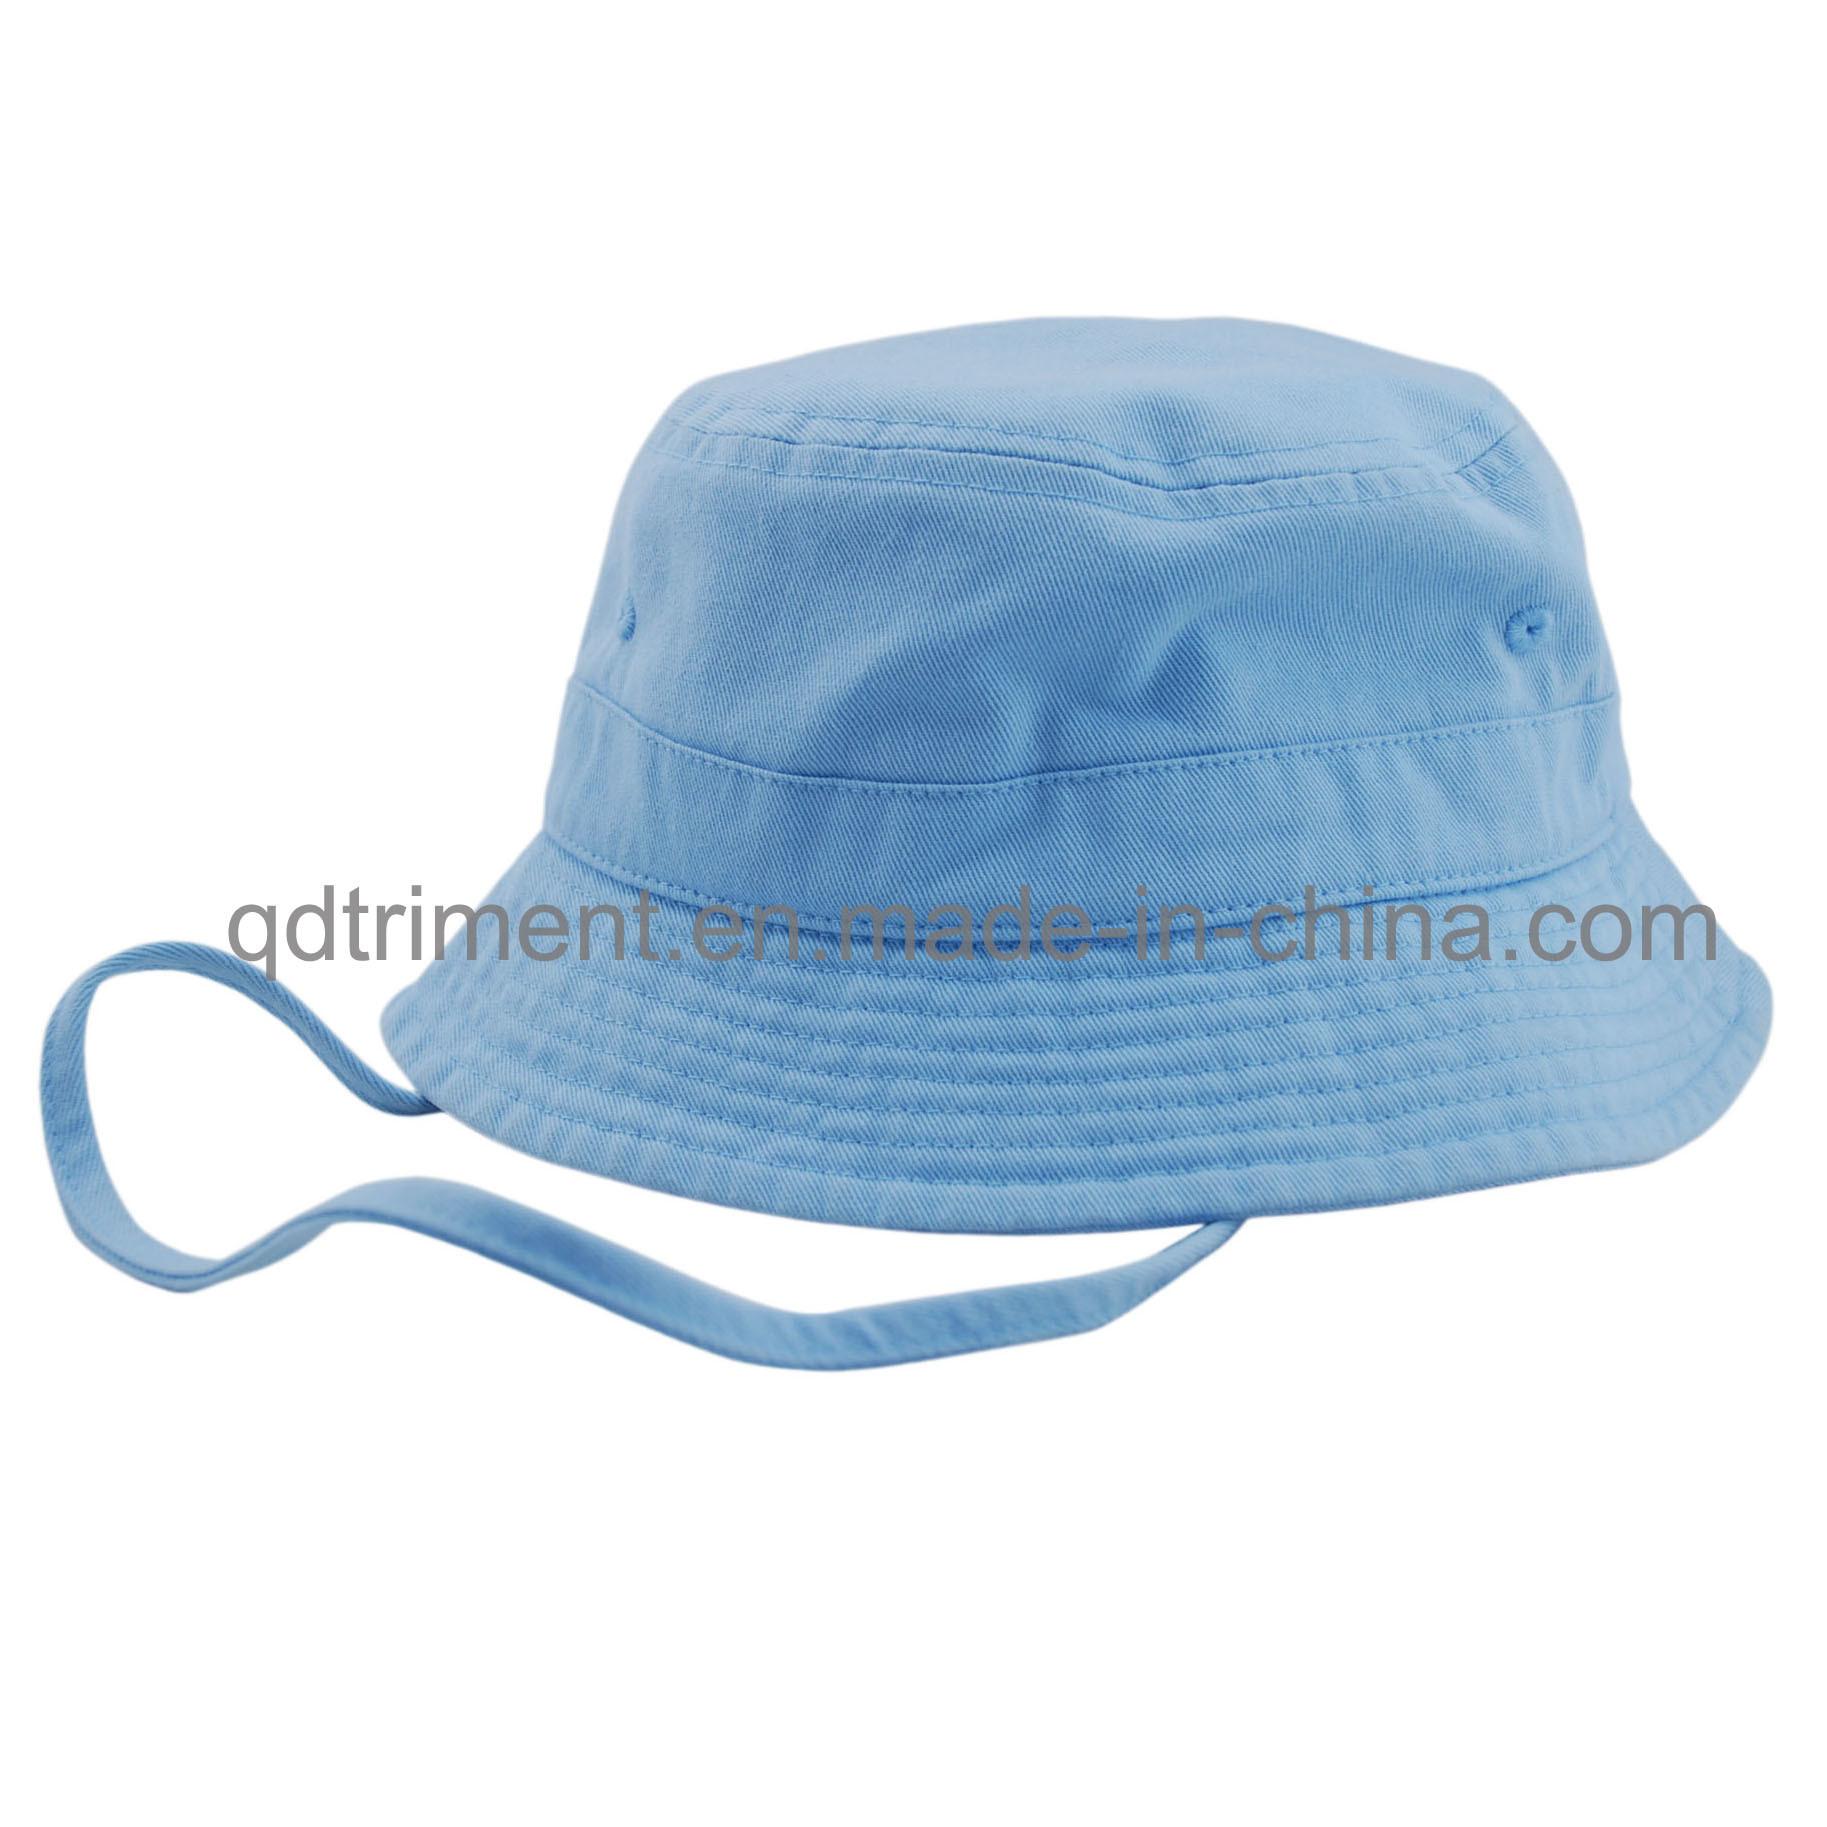 Washed Cotton Canvas Leisure Fisherman Bucket Hat (TMBH2021)